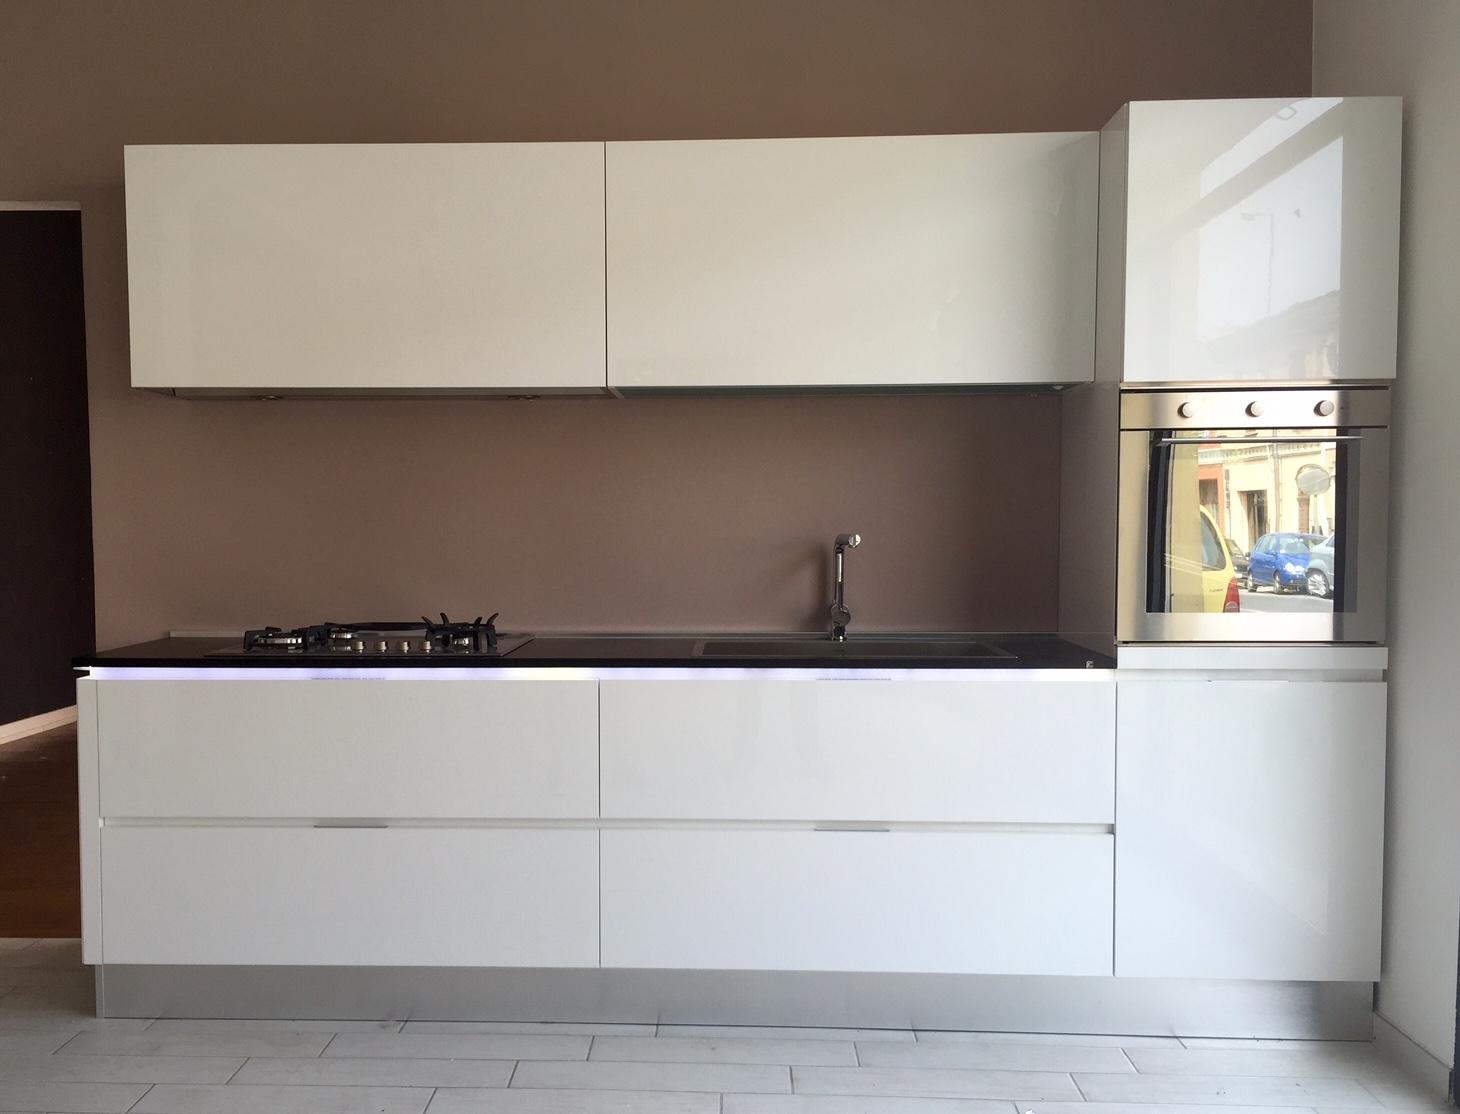 Cucina Composit Mya Design Laccato Lucido Bianca - Cucine a prezzi ...